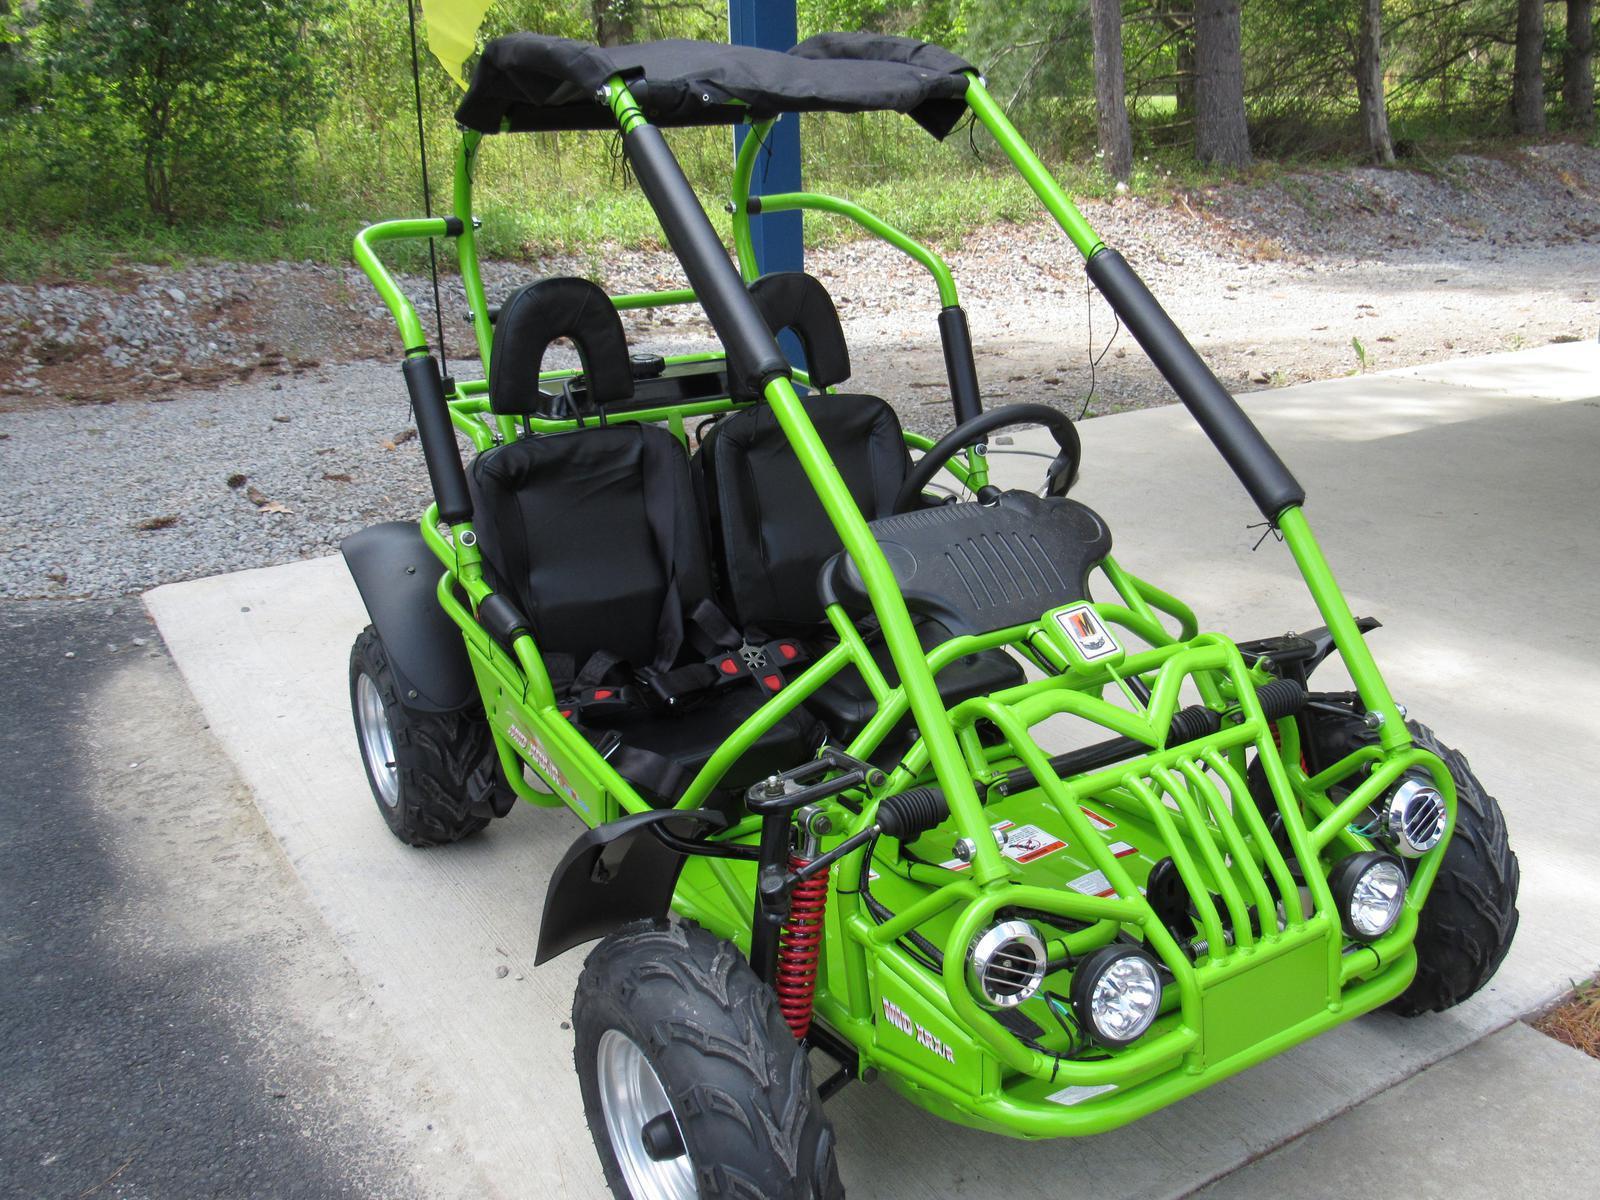 Mid XRX-R Green